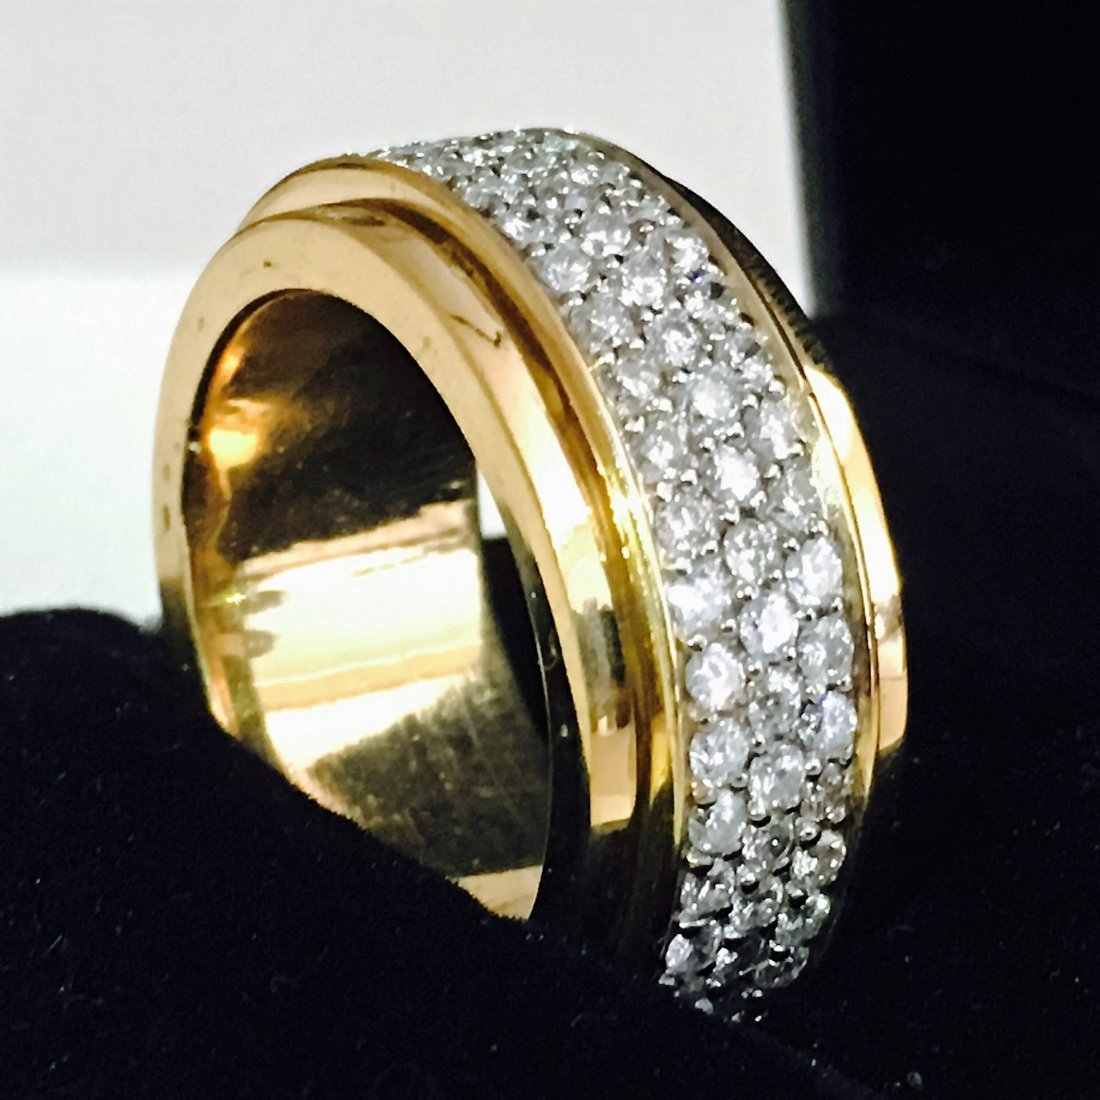 18k Yellow Gold, 4.50 Carat VVS Diamond Ring - 5